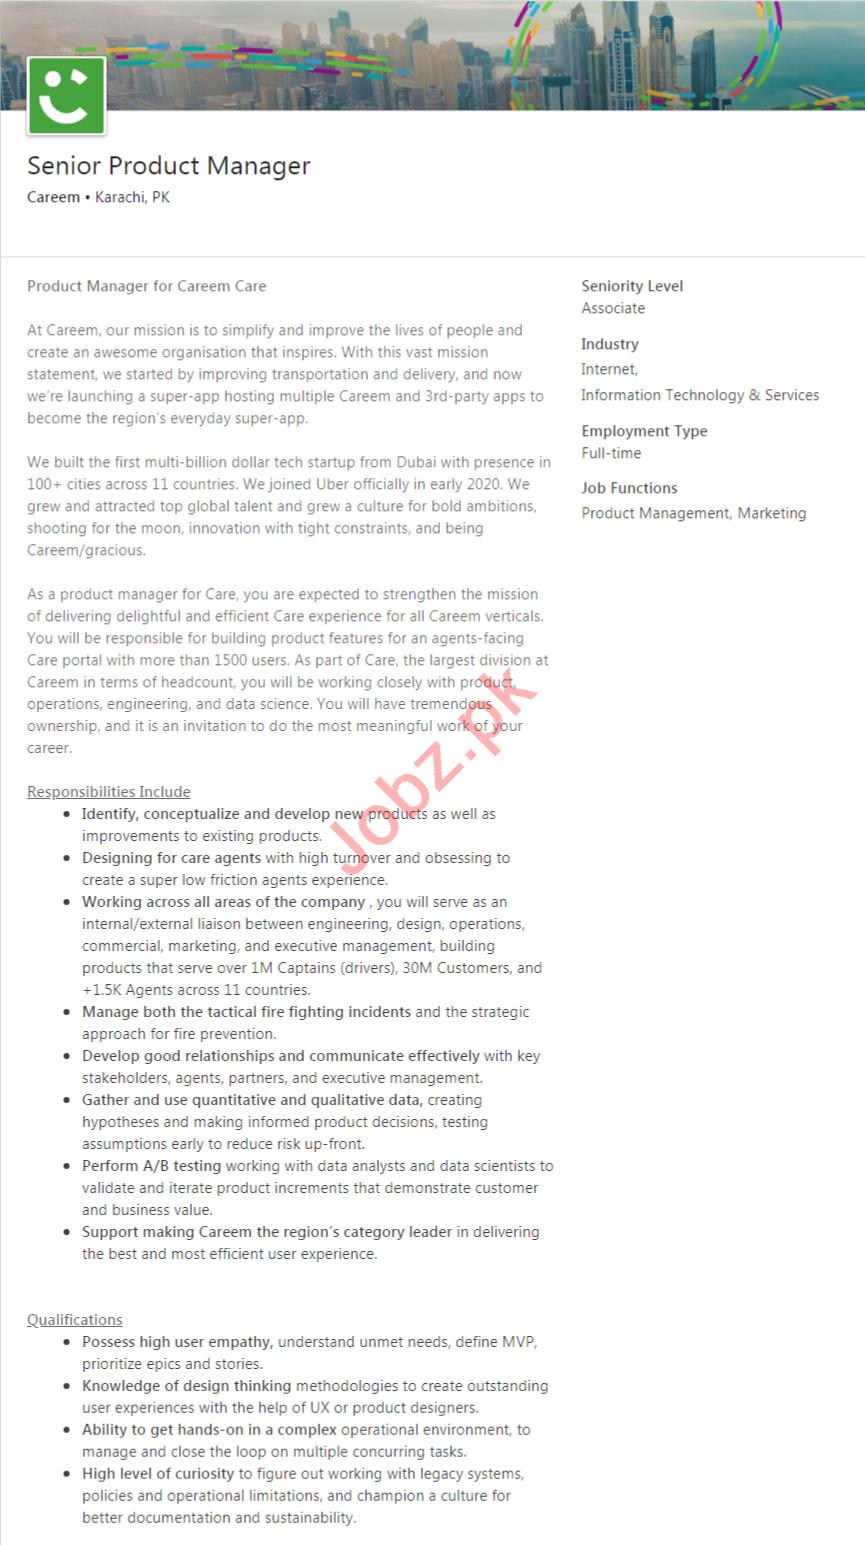 Careem Karachi Jobs 2020 for Senior Product Manager